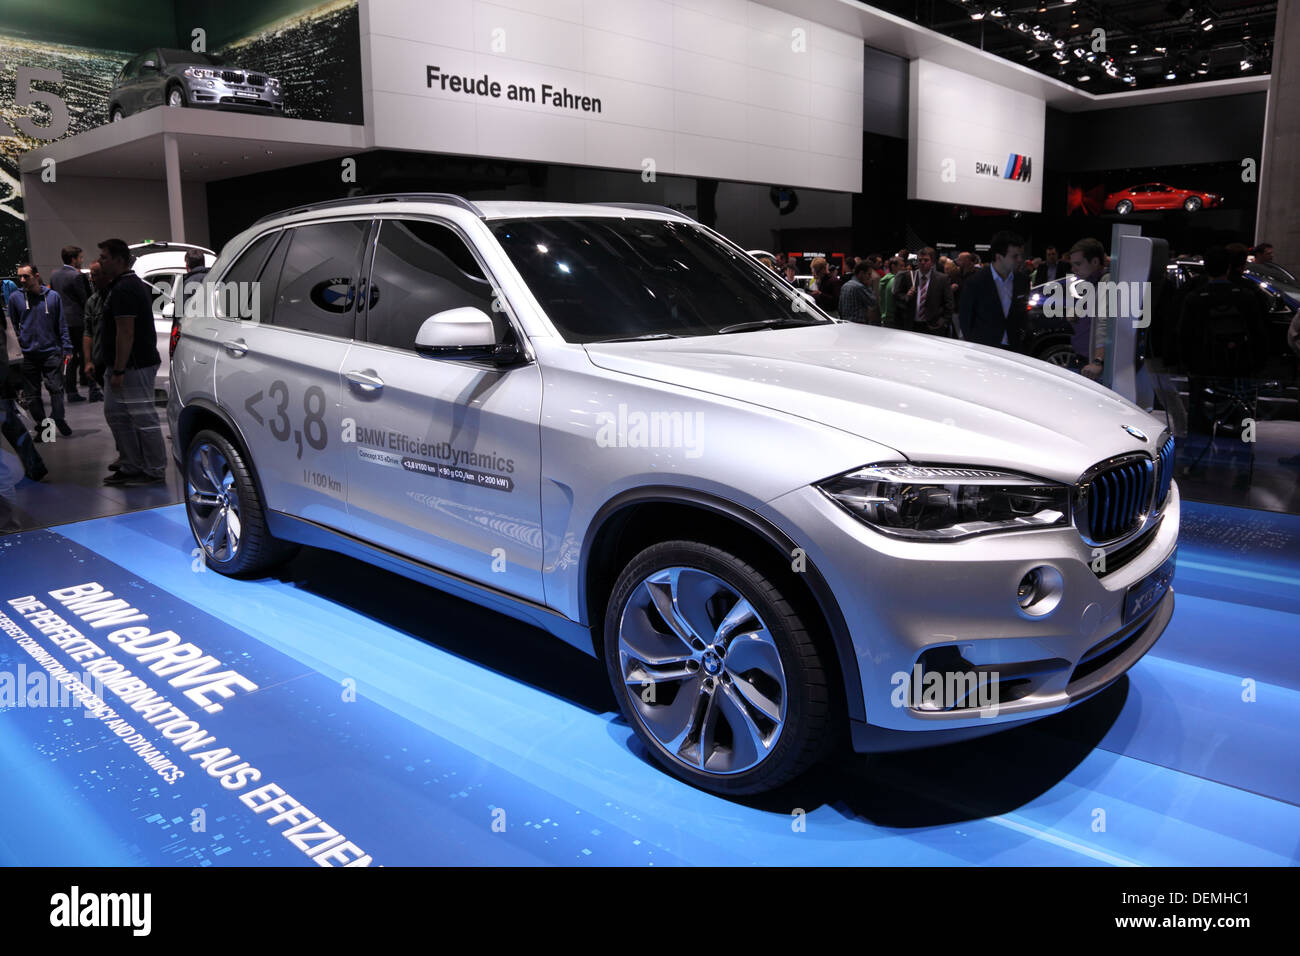 BMW X5 EfficientDynamics at the 65th IAA in Frankfurt, Germany - Stock Image